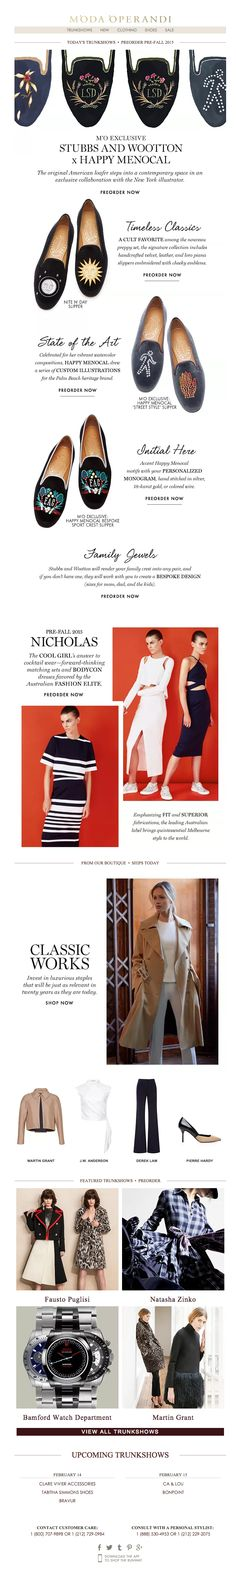 Moda Operandi | newsletter | fashion email | fashion design | email | email marketing | email inspiration | e-mail